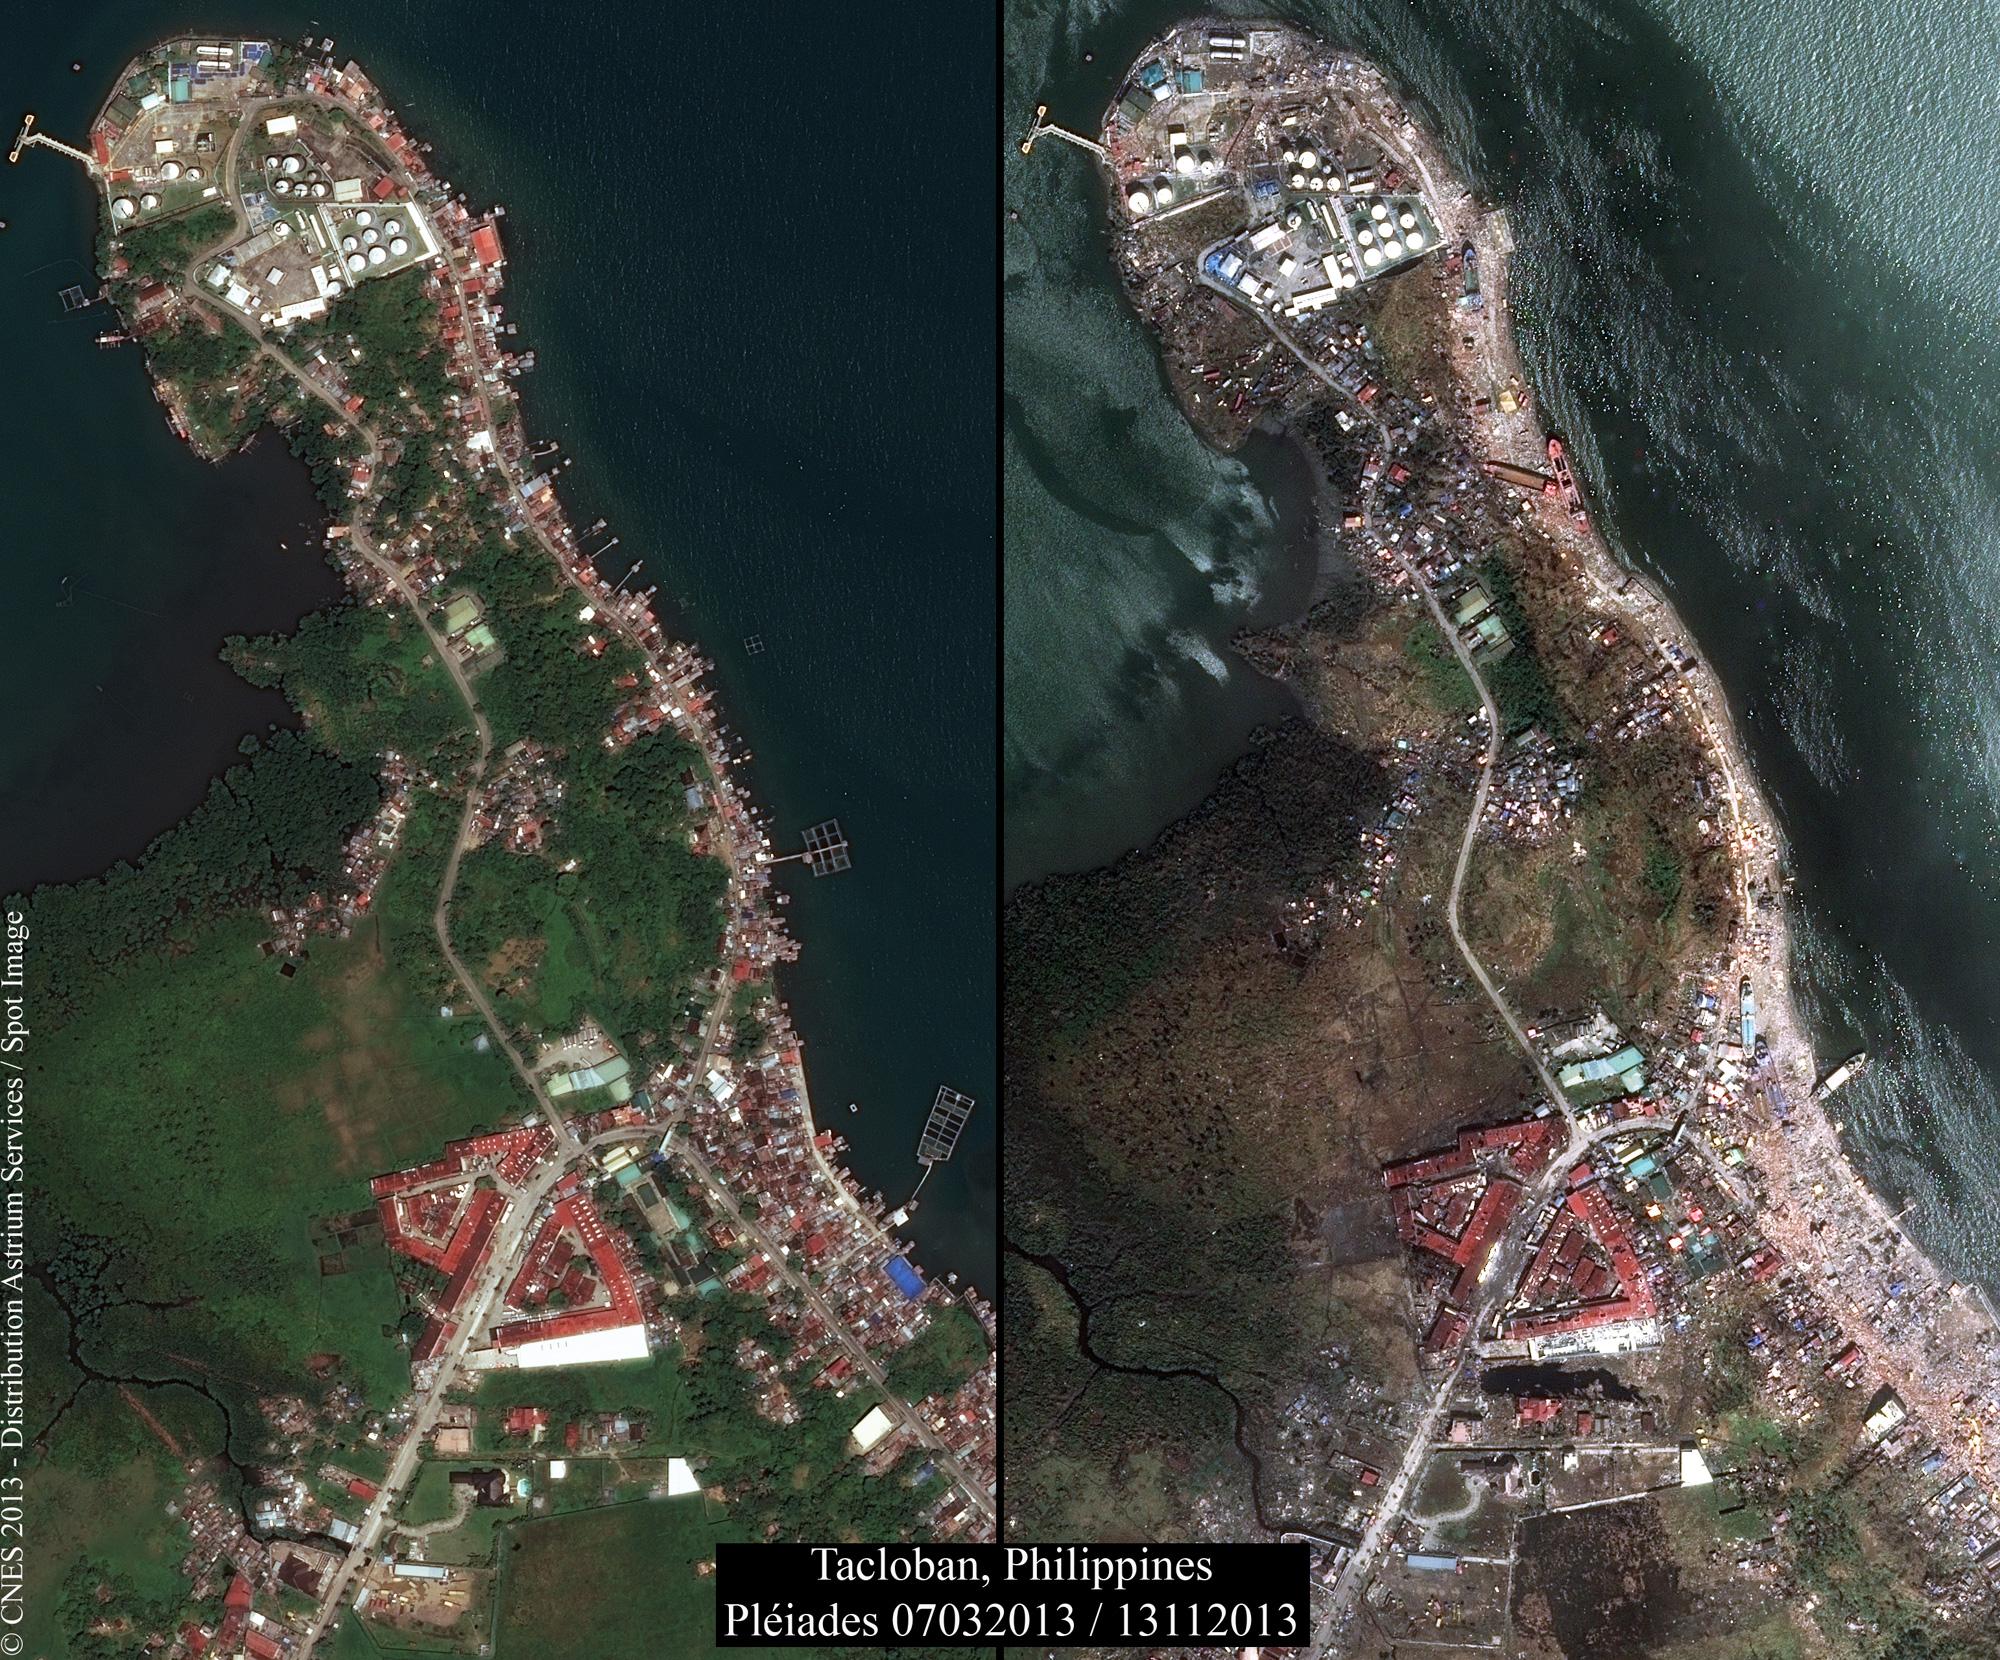 Typhon_tacloban_Cap_pleiades_2000.jpg